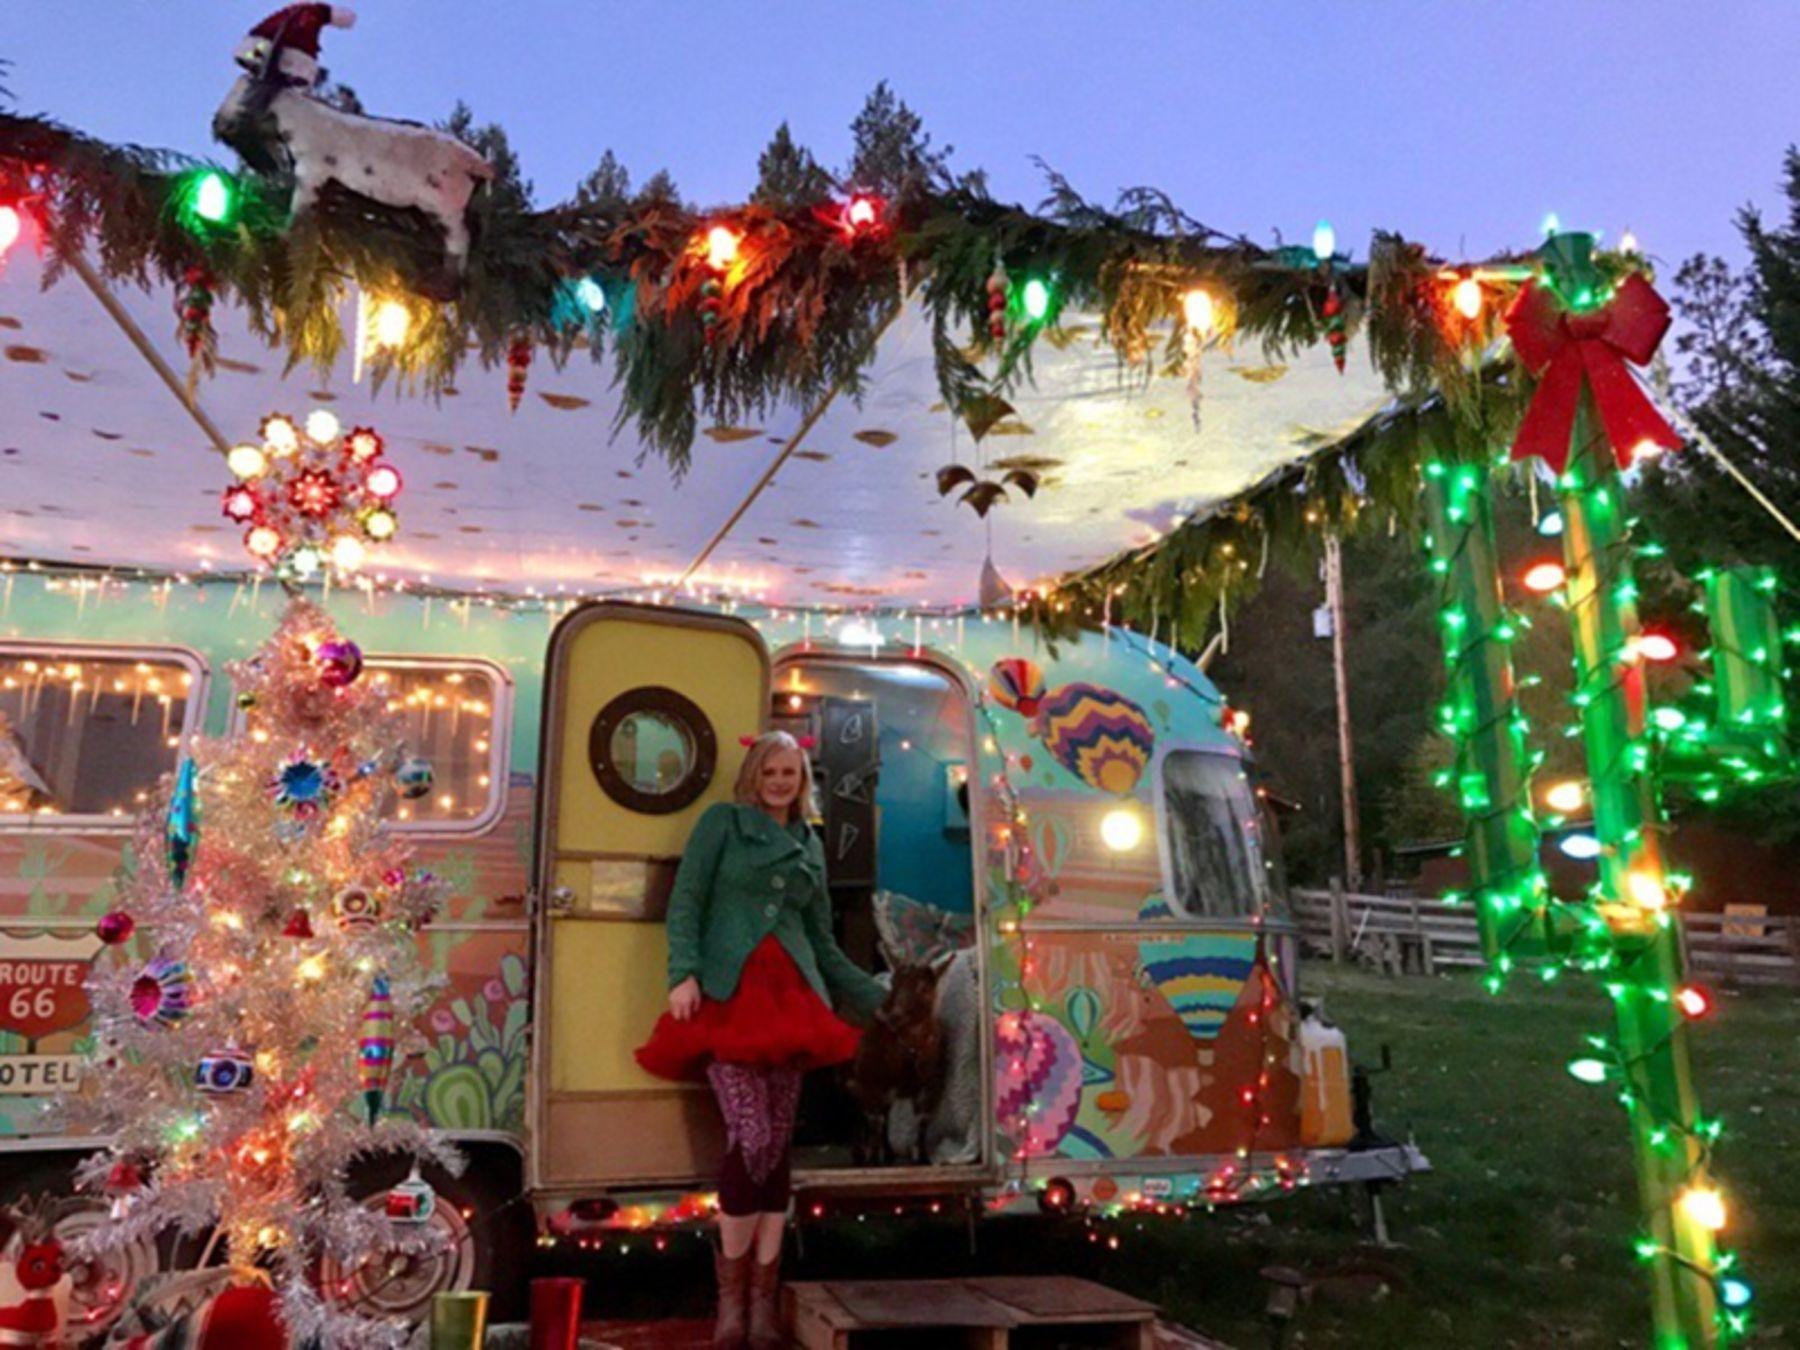 Splendid Christmas Rv Decorations Ideas For Valuable Moment45